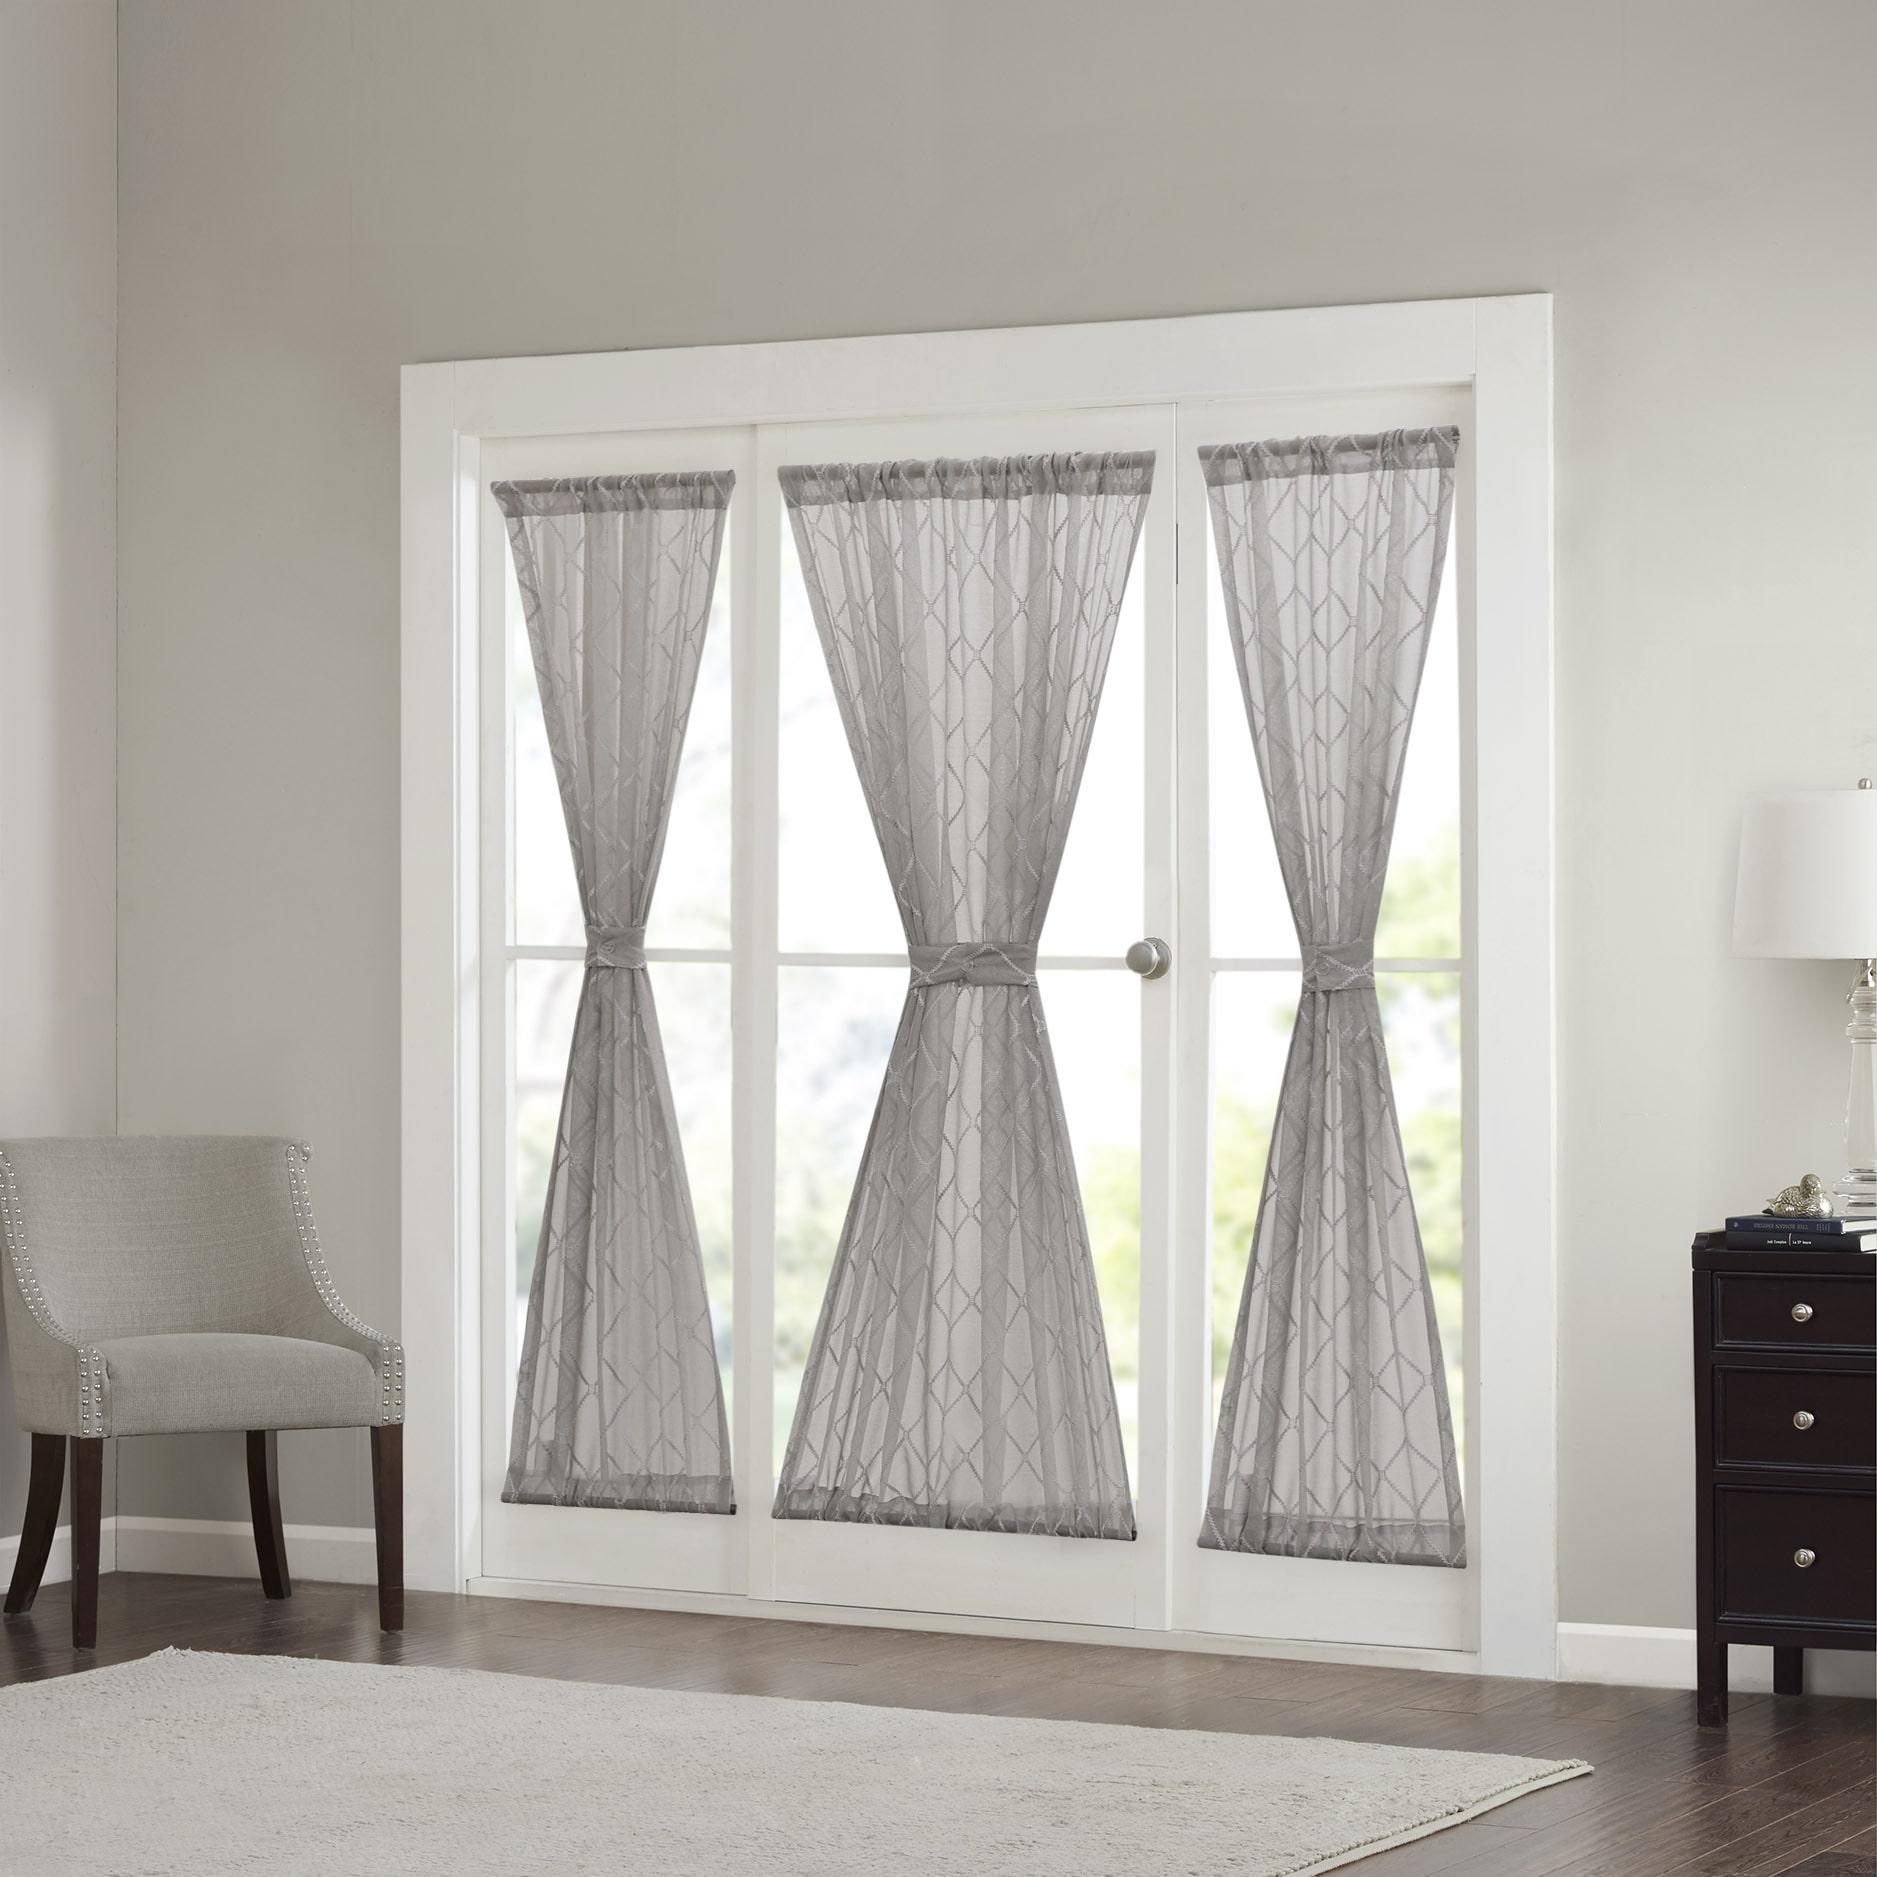 Sidelight curtains walmart - Sidelight Curtain Panels